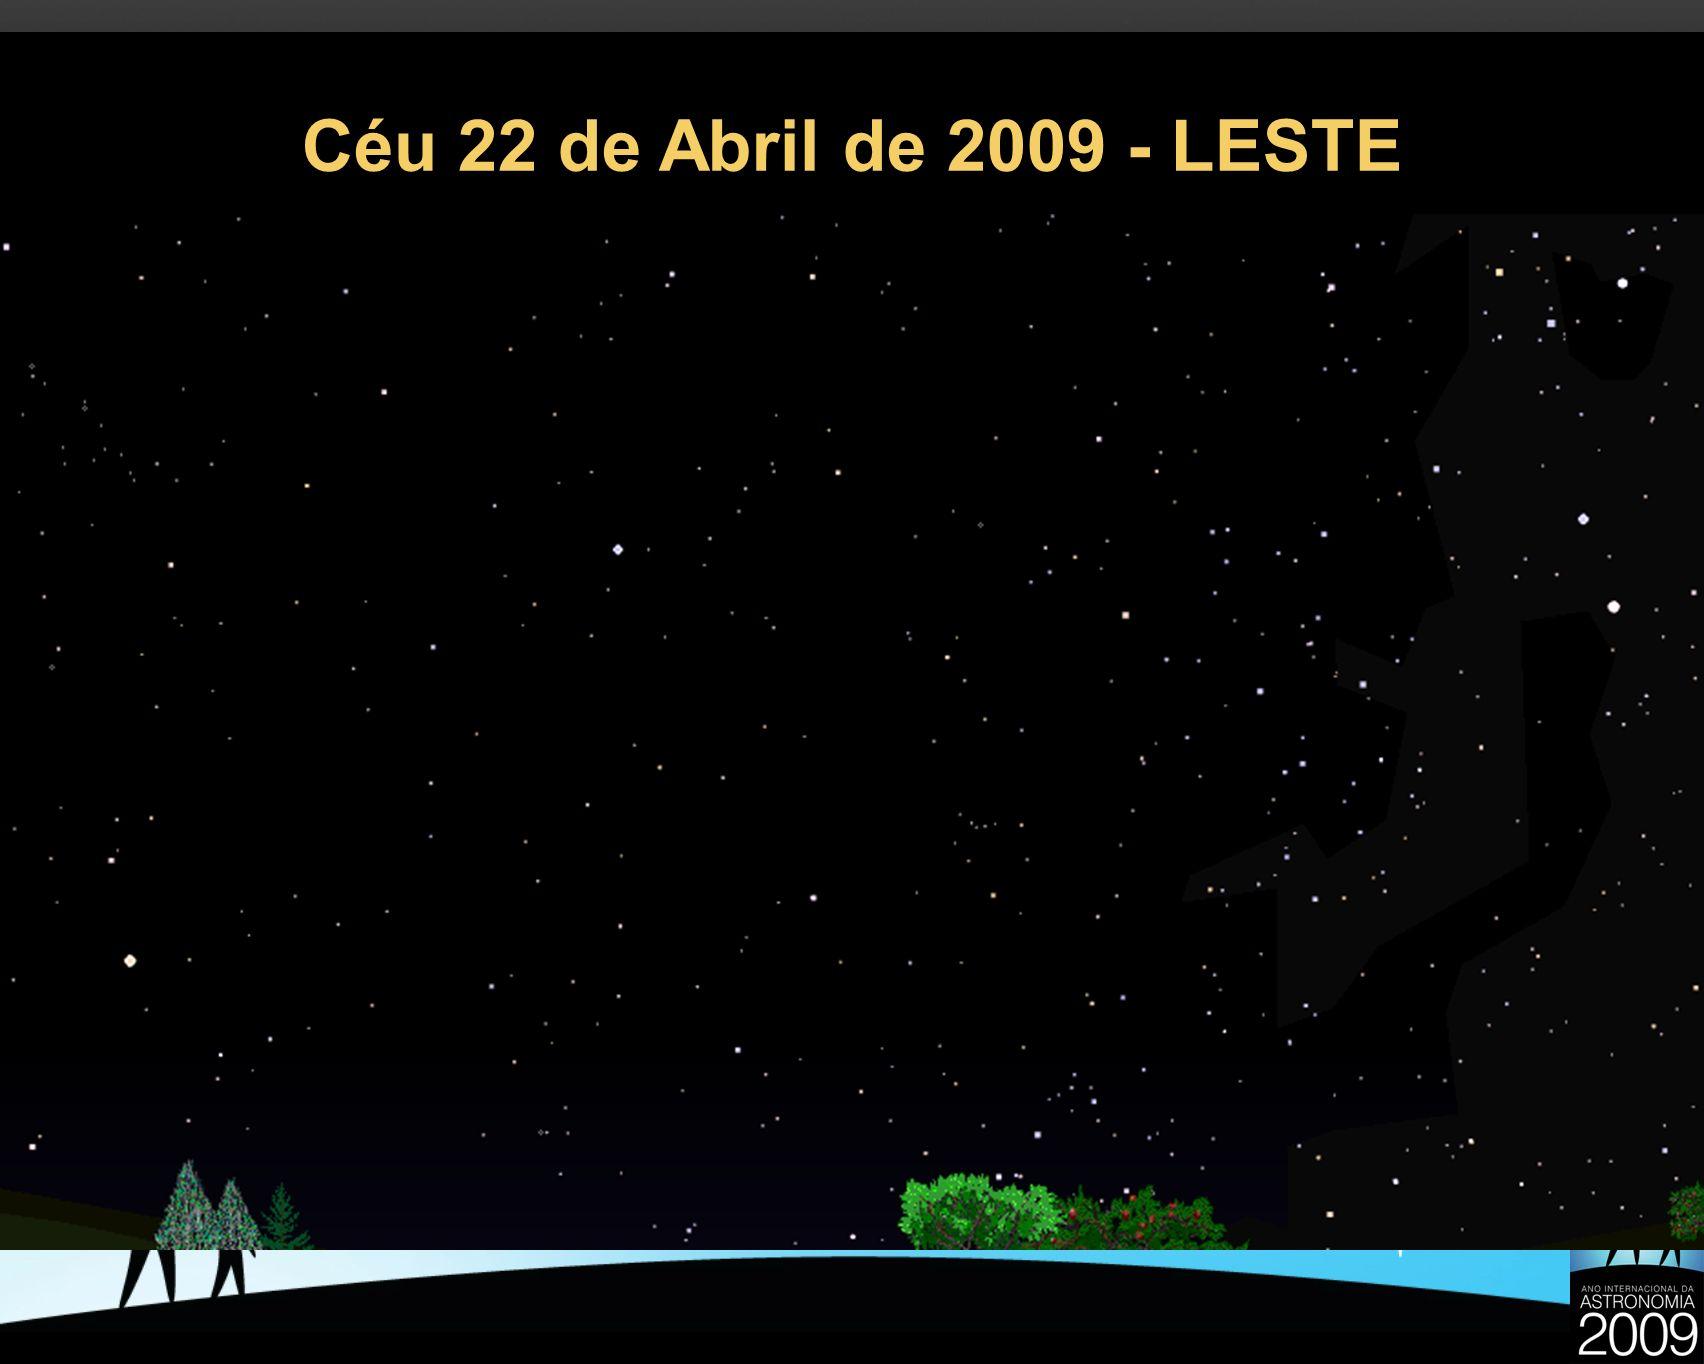 Céu 22 de Abril de 2009 - LESTE 23